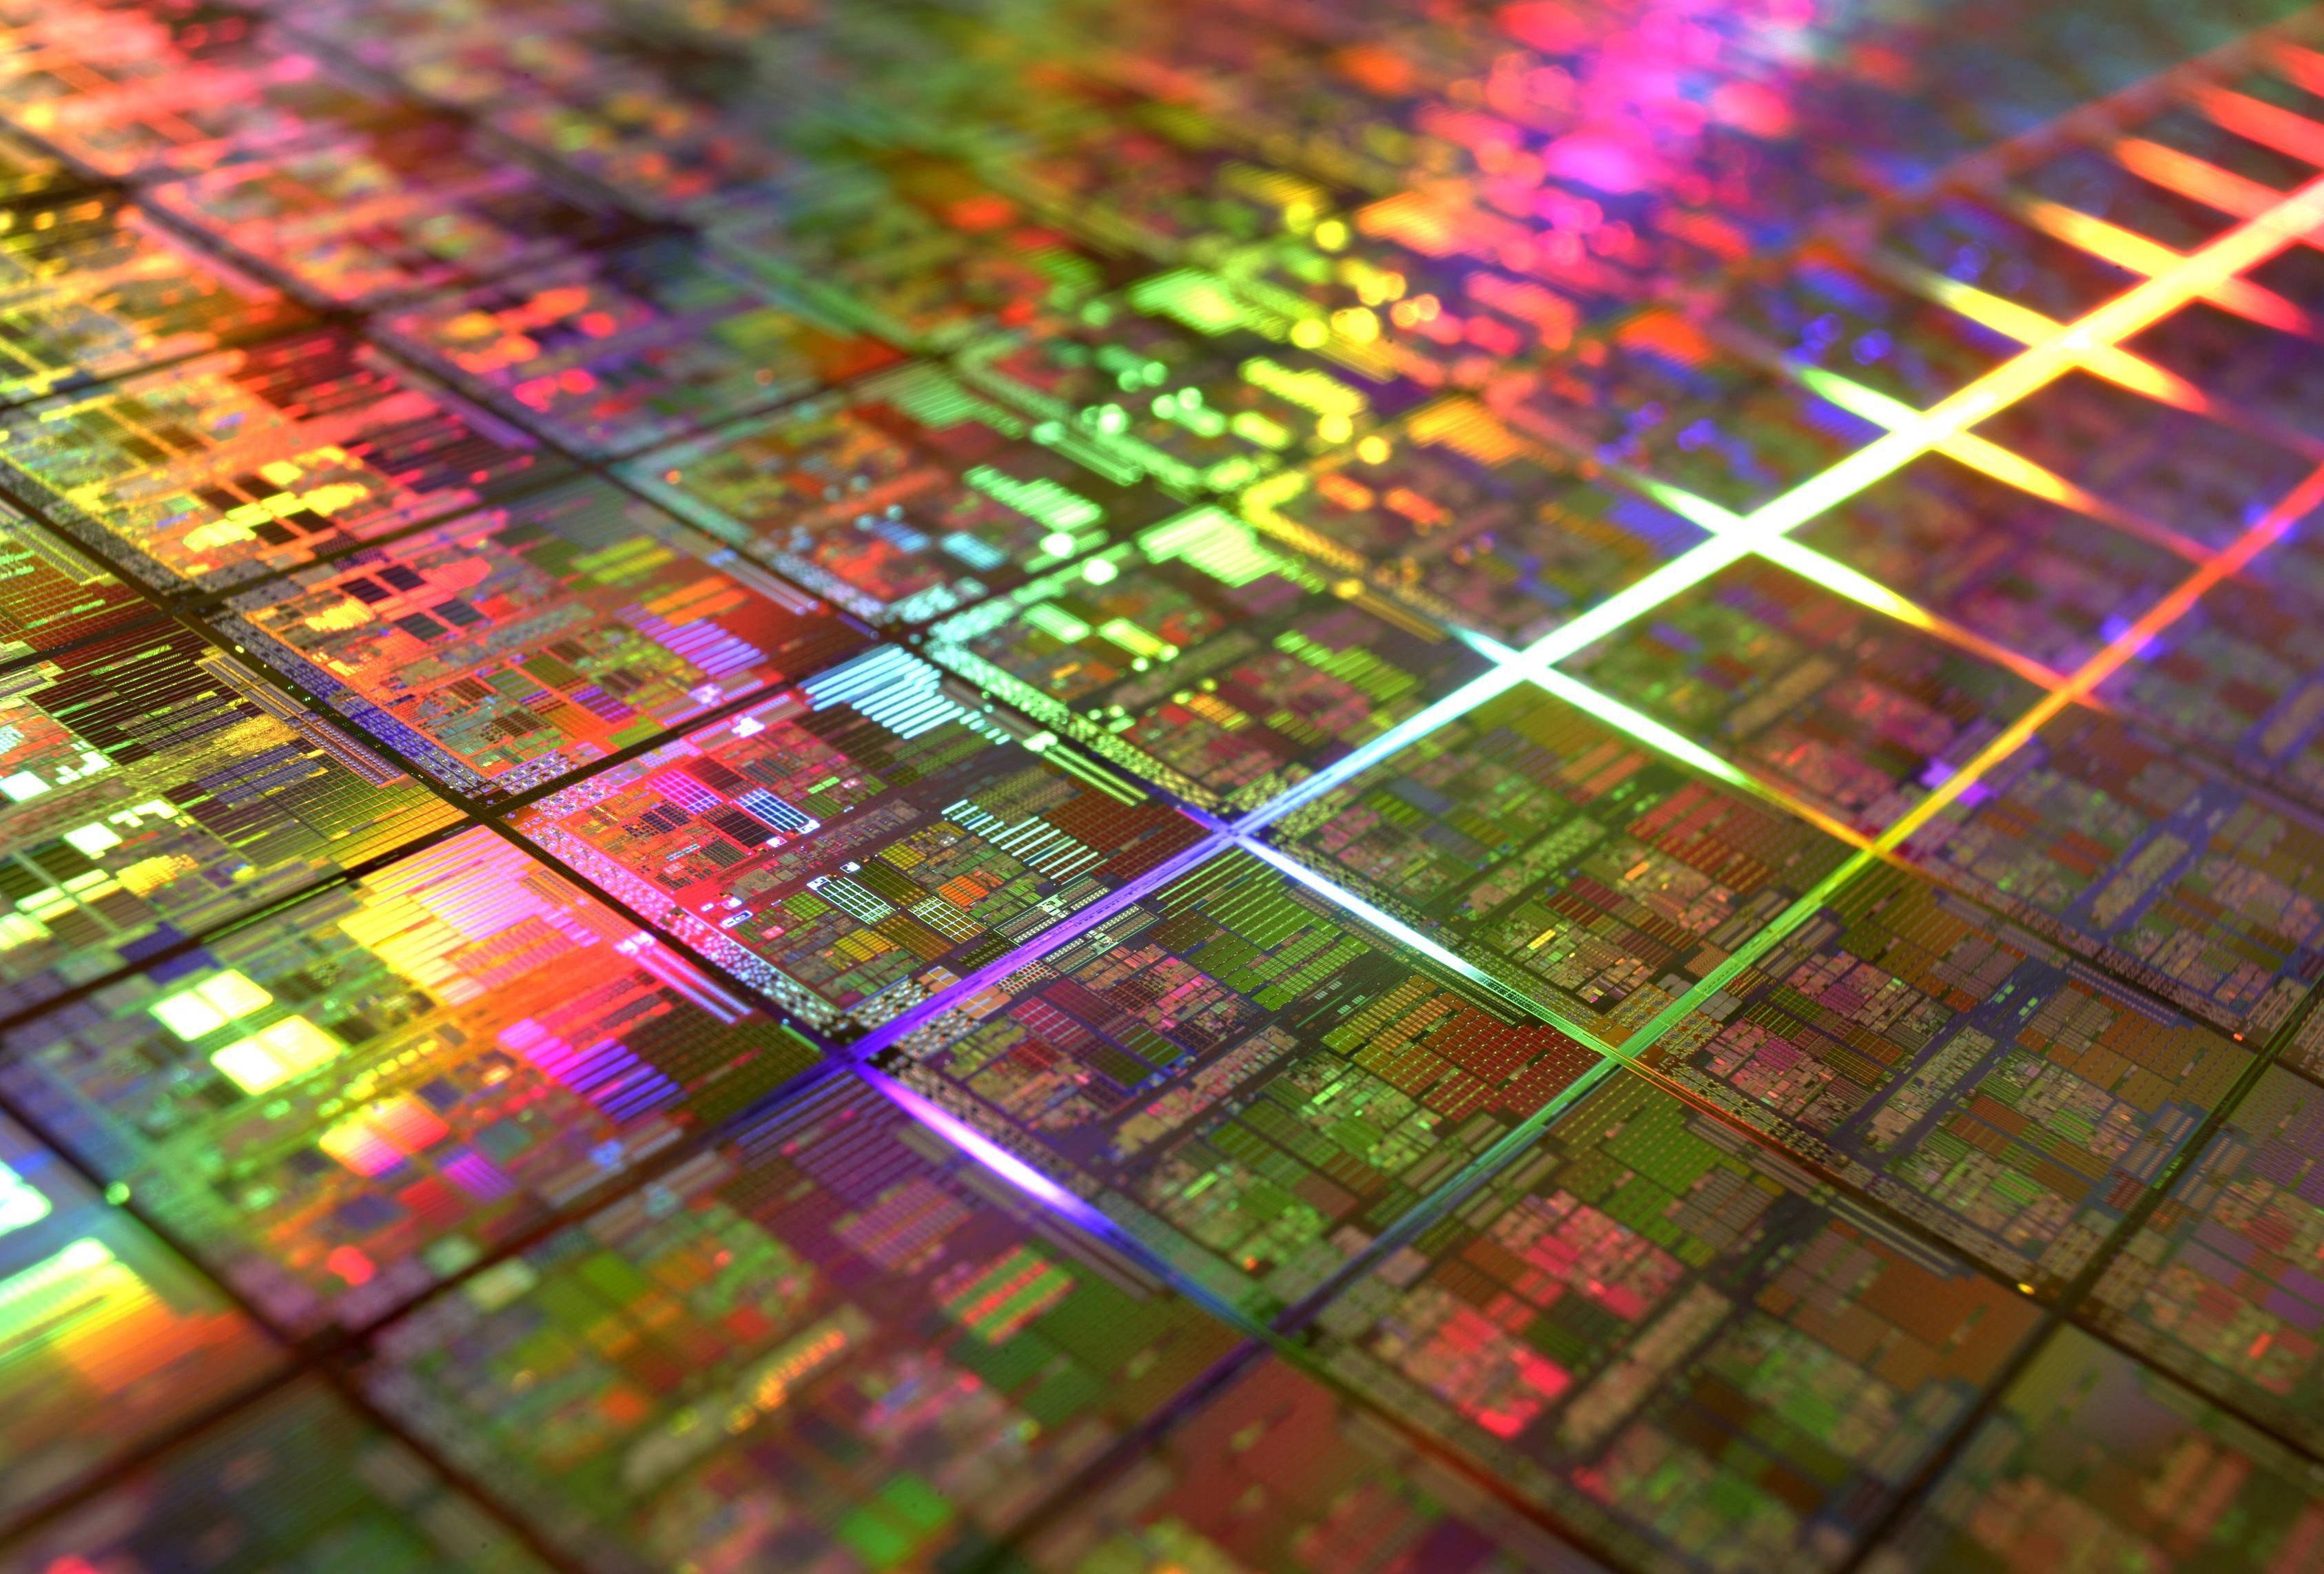 Intel finally shares Haswells secrets reveals new work on ultra 3373x2285